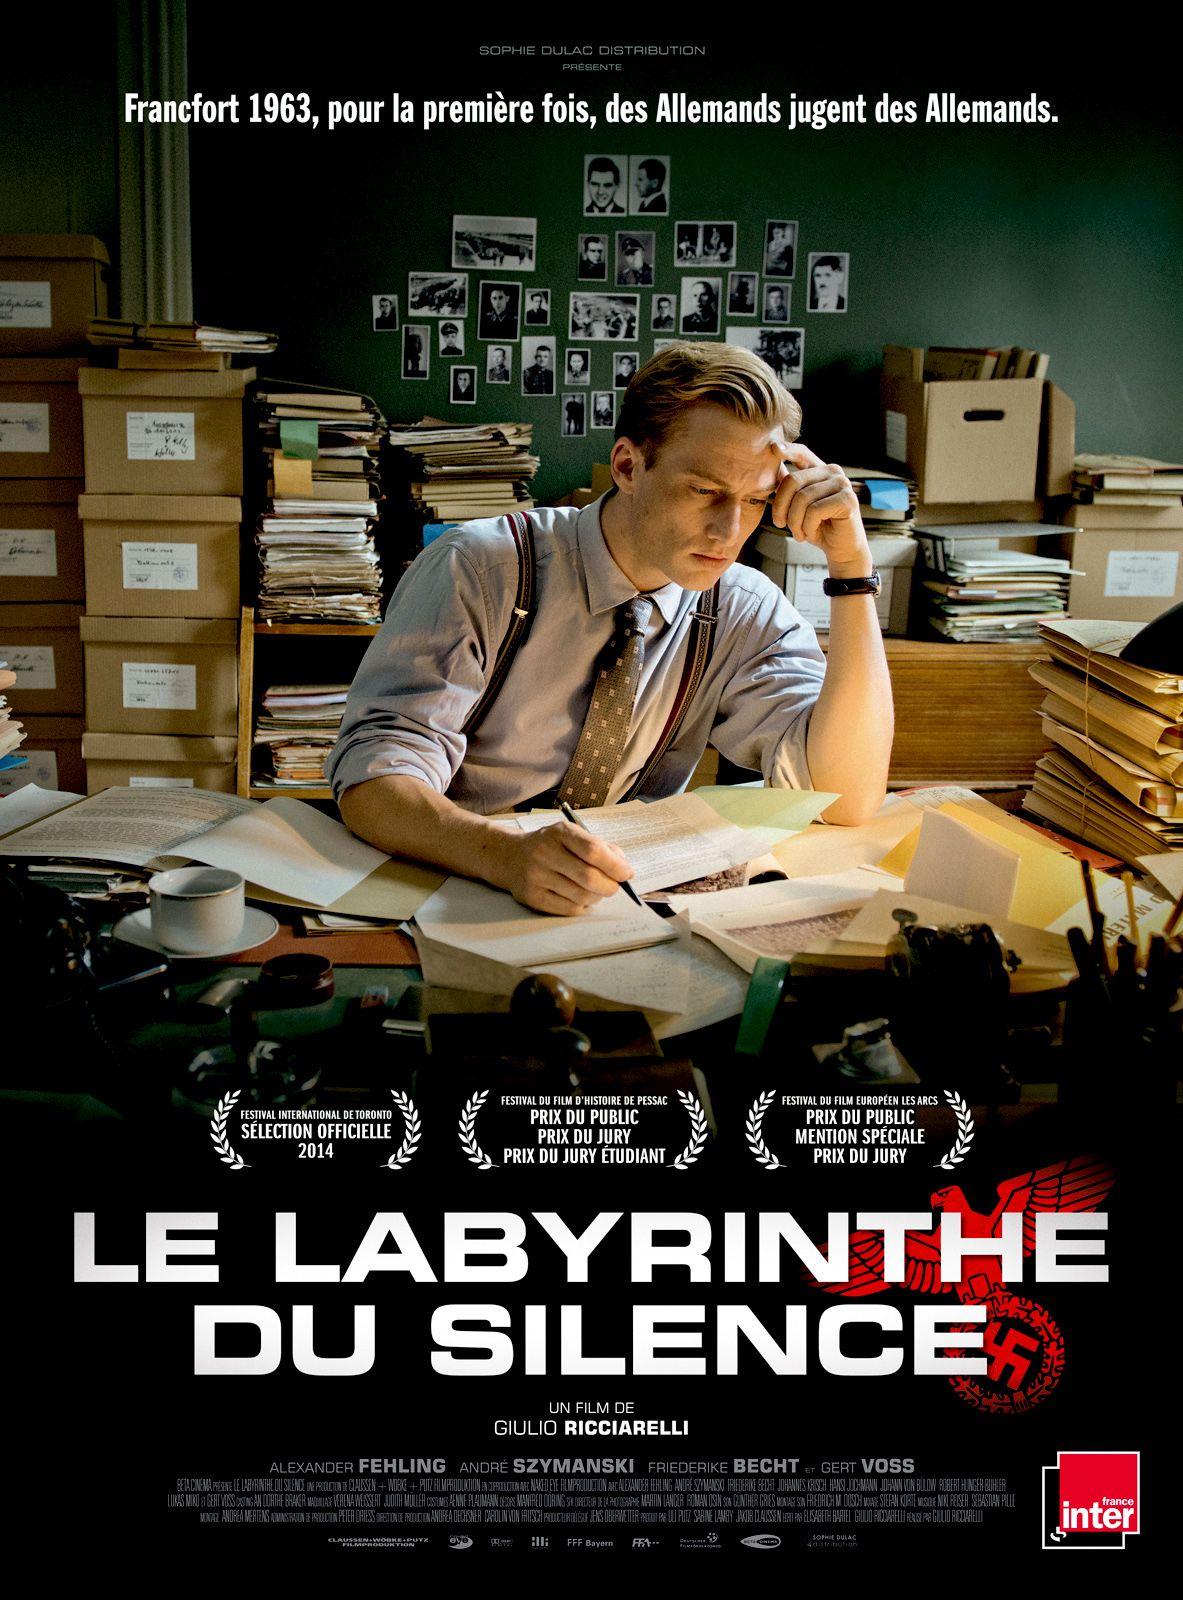 Le Prix Du Silence Film : silence, Labyrinthe, Silence, Books,, Cinema, Movies,